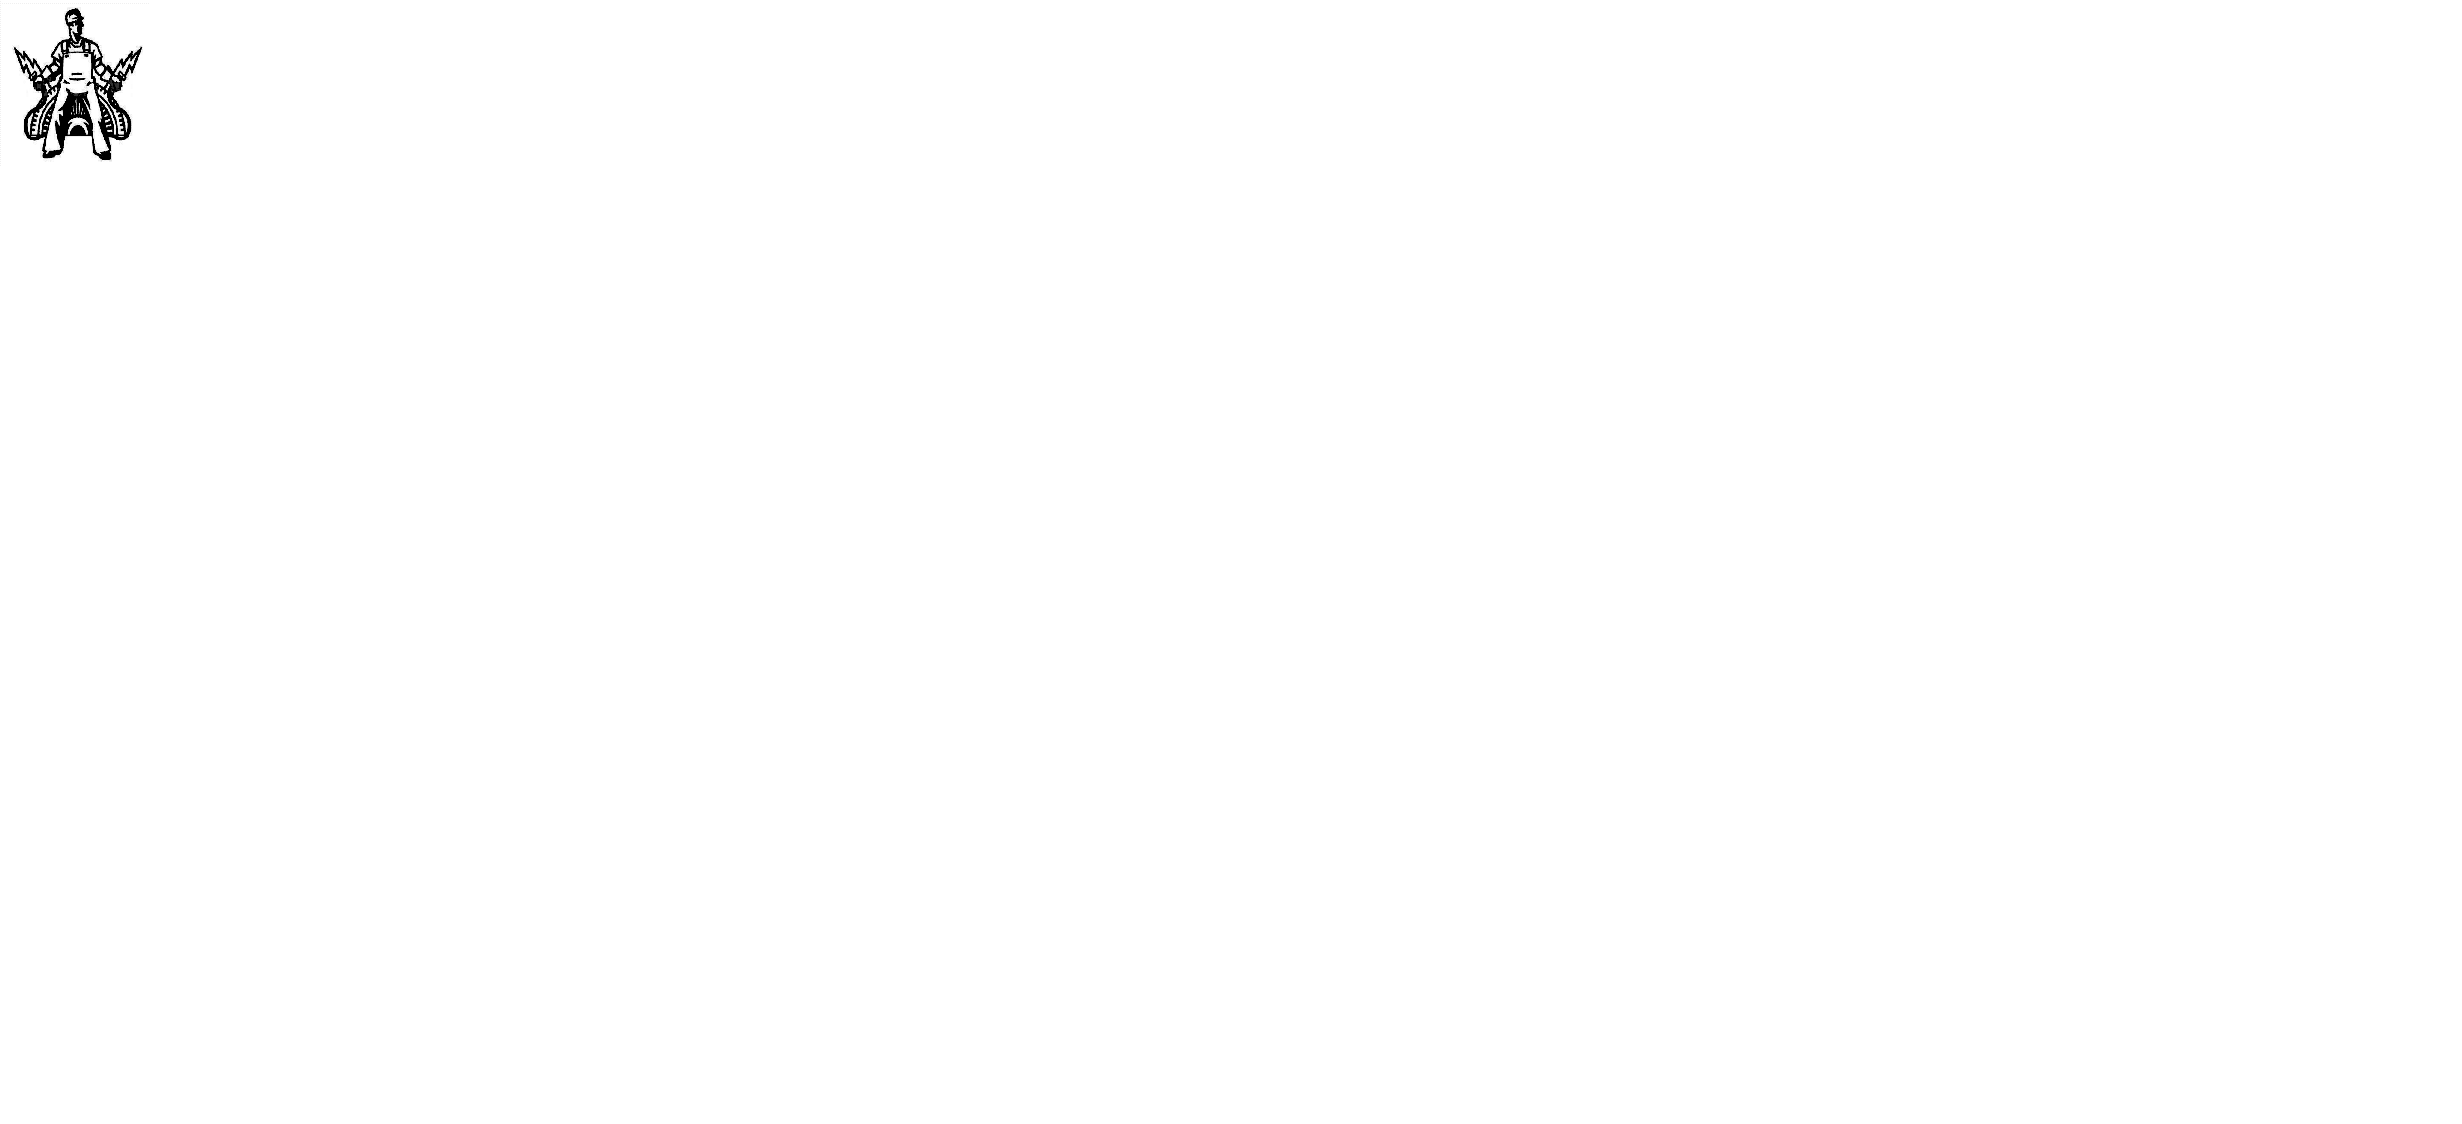 Jack Flash Electric & Lighting Reviews - Philadelphia, PA ... on tube terminals, tube fuses, tube dimensions, tube assembly,